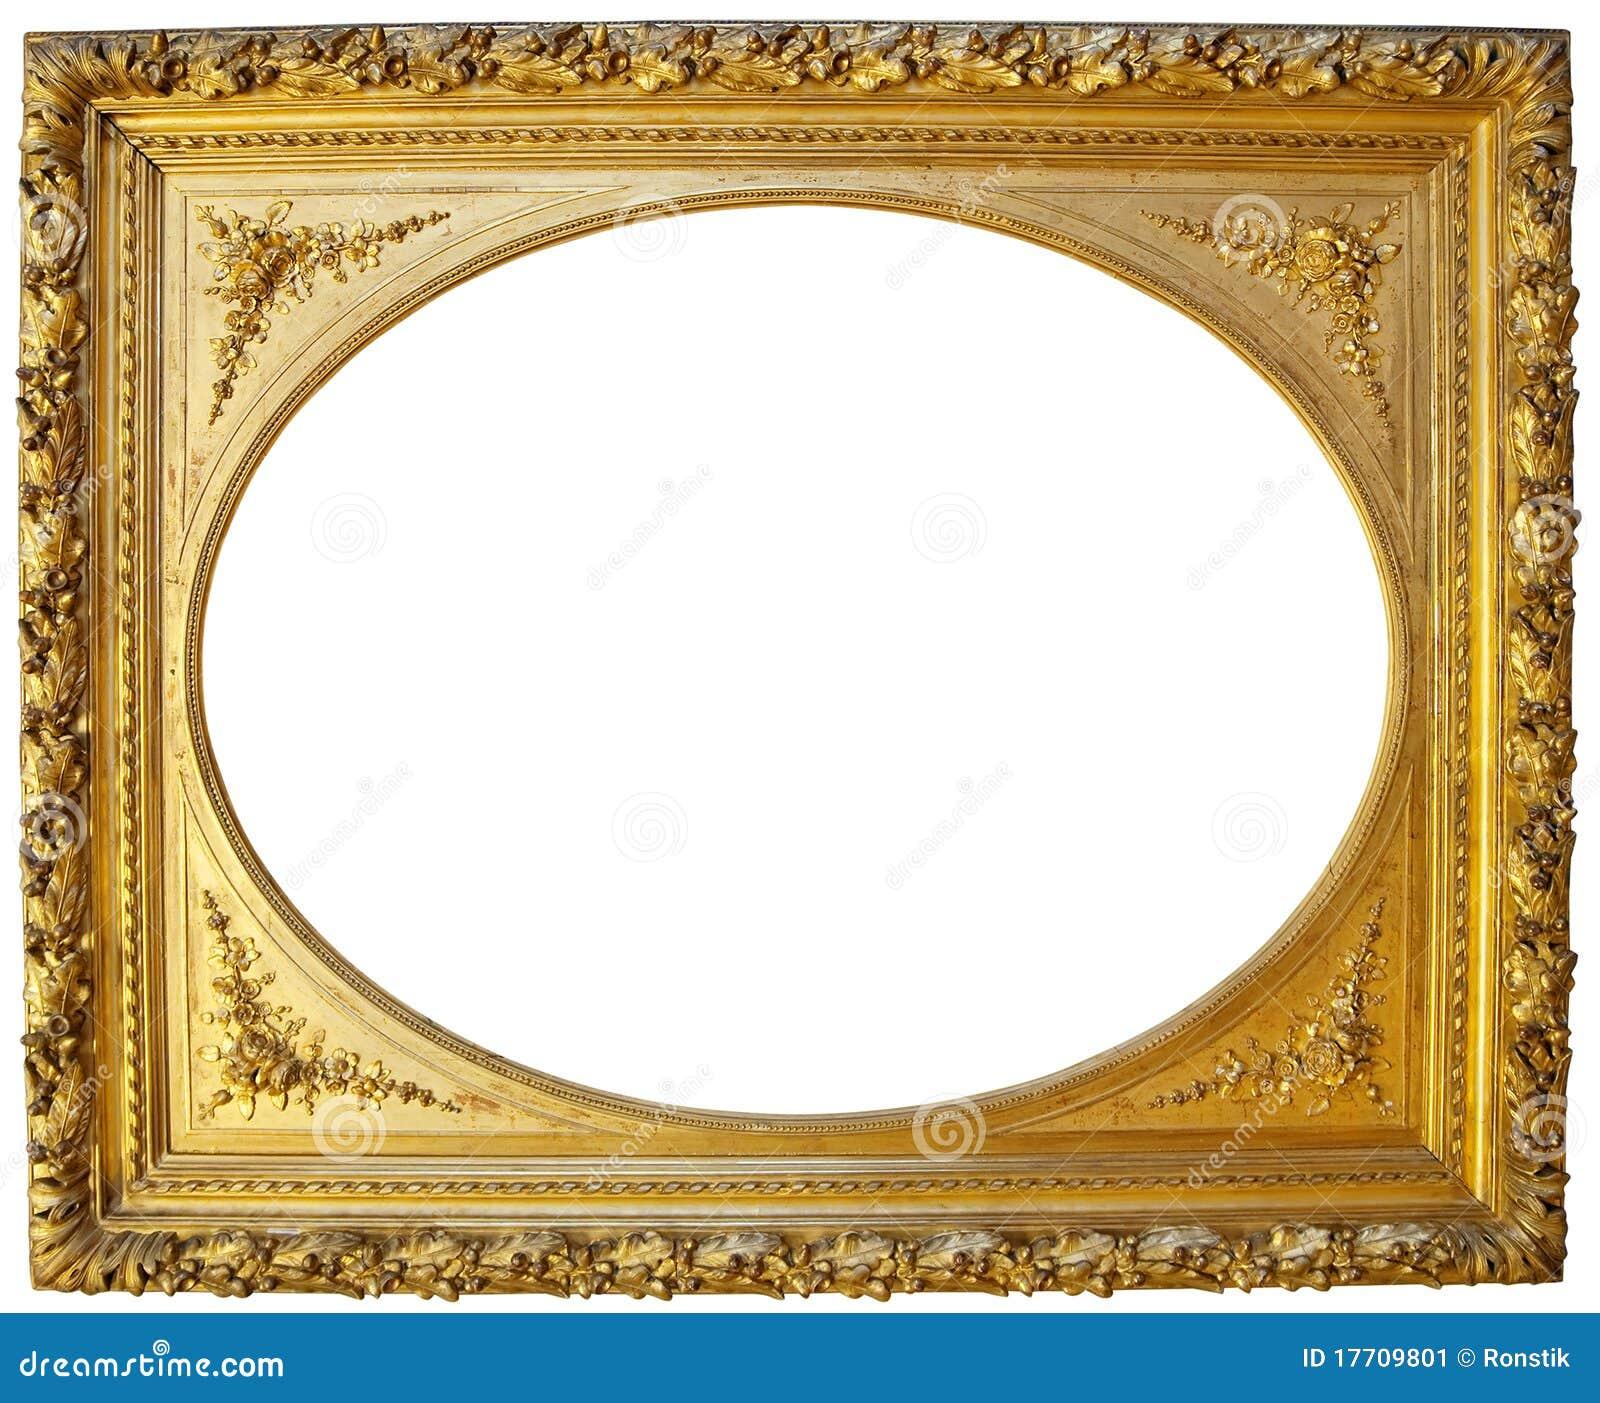 Oval vintage gold frame 5860522 - emma-stone.info